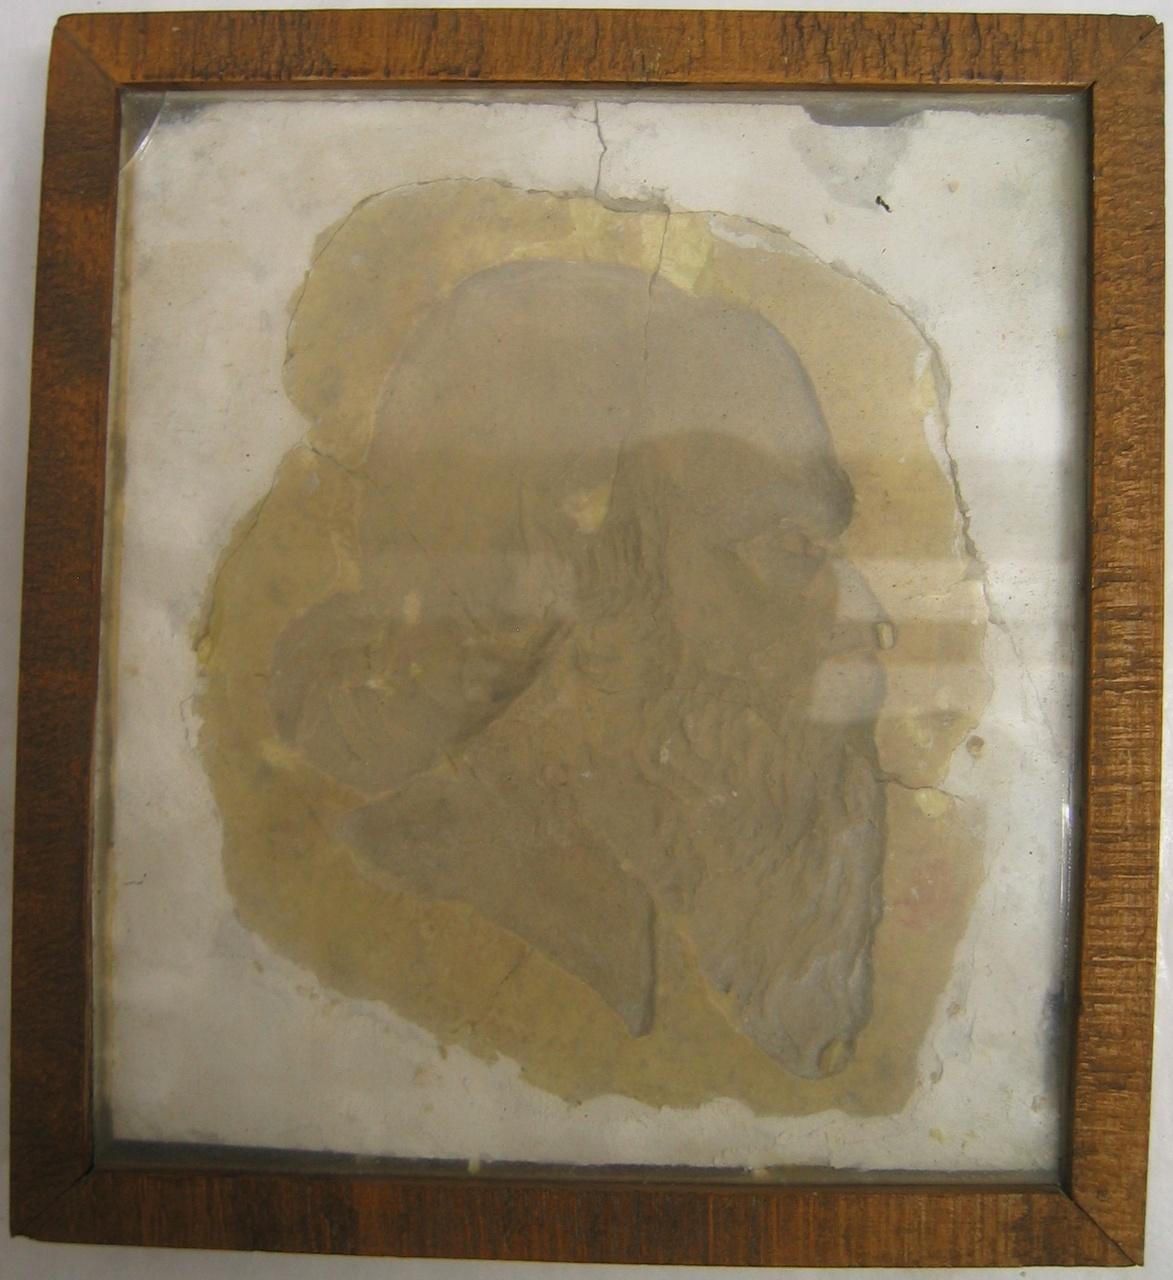 Vorm voor marsepein en/of suikerwerk, voorstellende hoofd van P.J.H. Cuypers